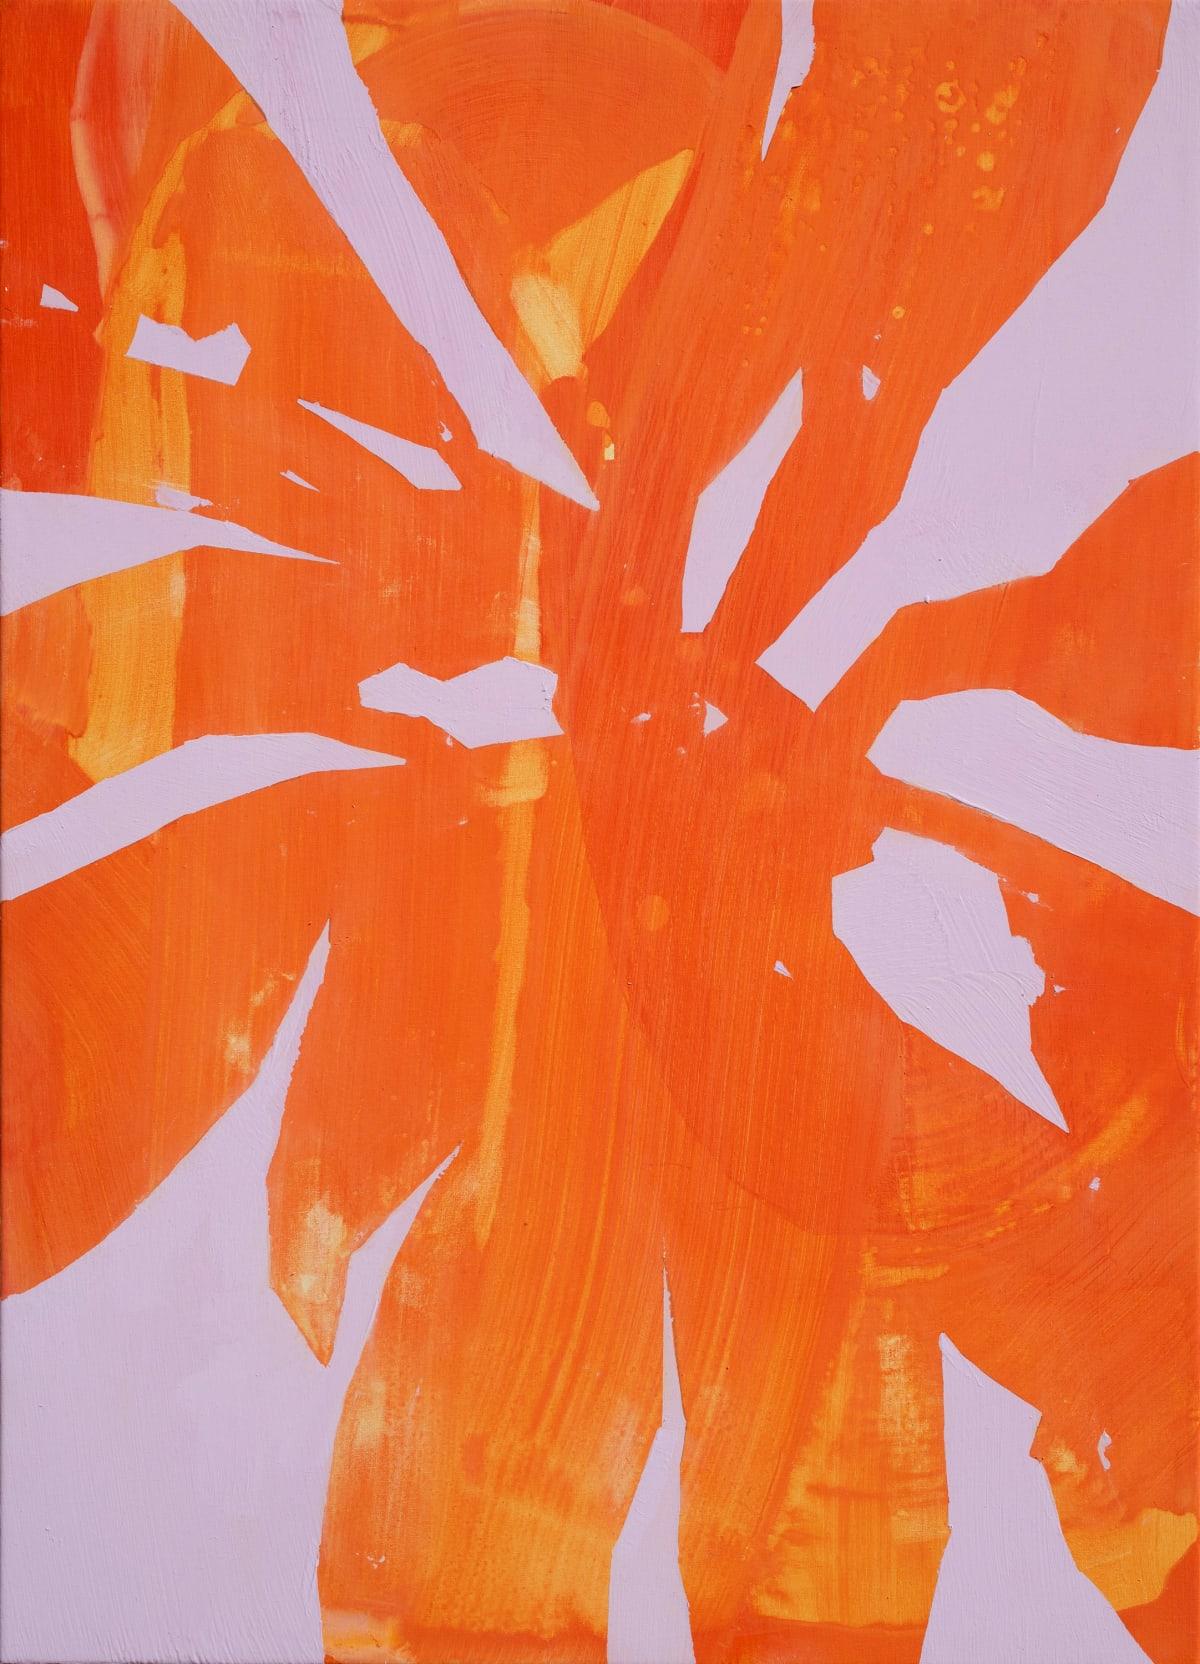 Davide Zappia Arancio, 2019 Acrylic on Canvas 50 x 70 cm 19 3/4 x 27 1/2 in